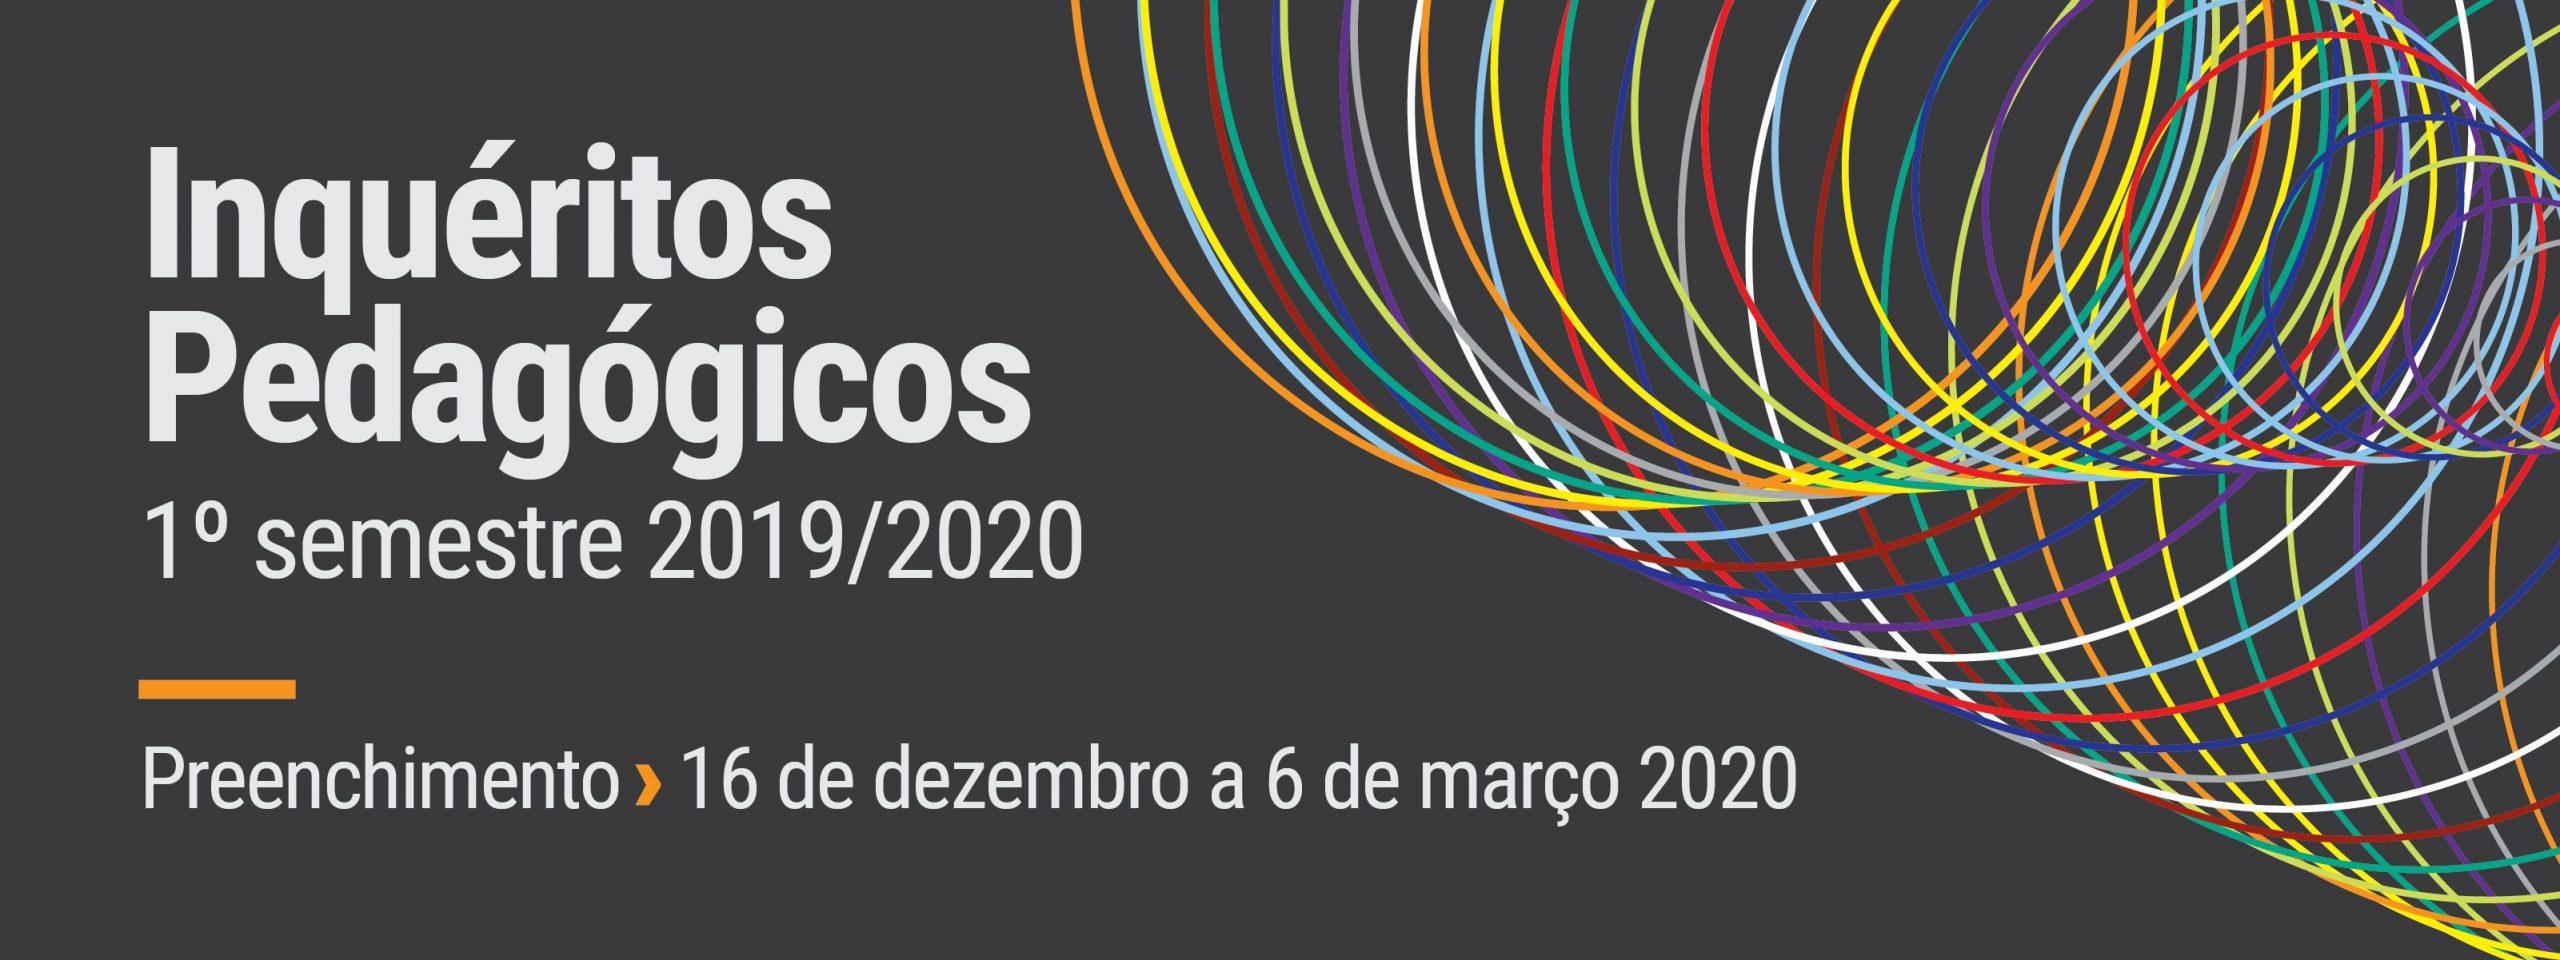 Preenchimento dos IPUPs 1 semestre 2019/2020